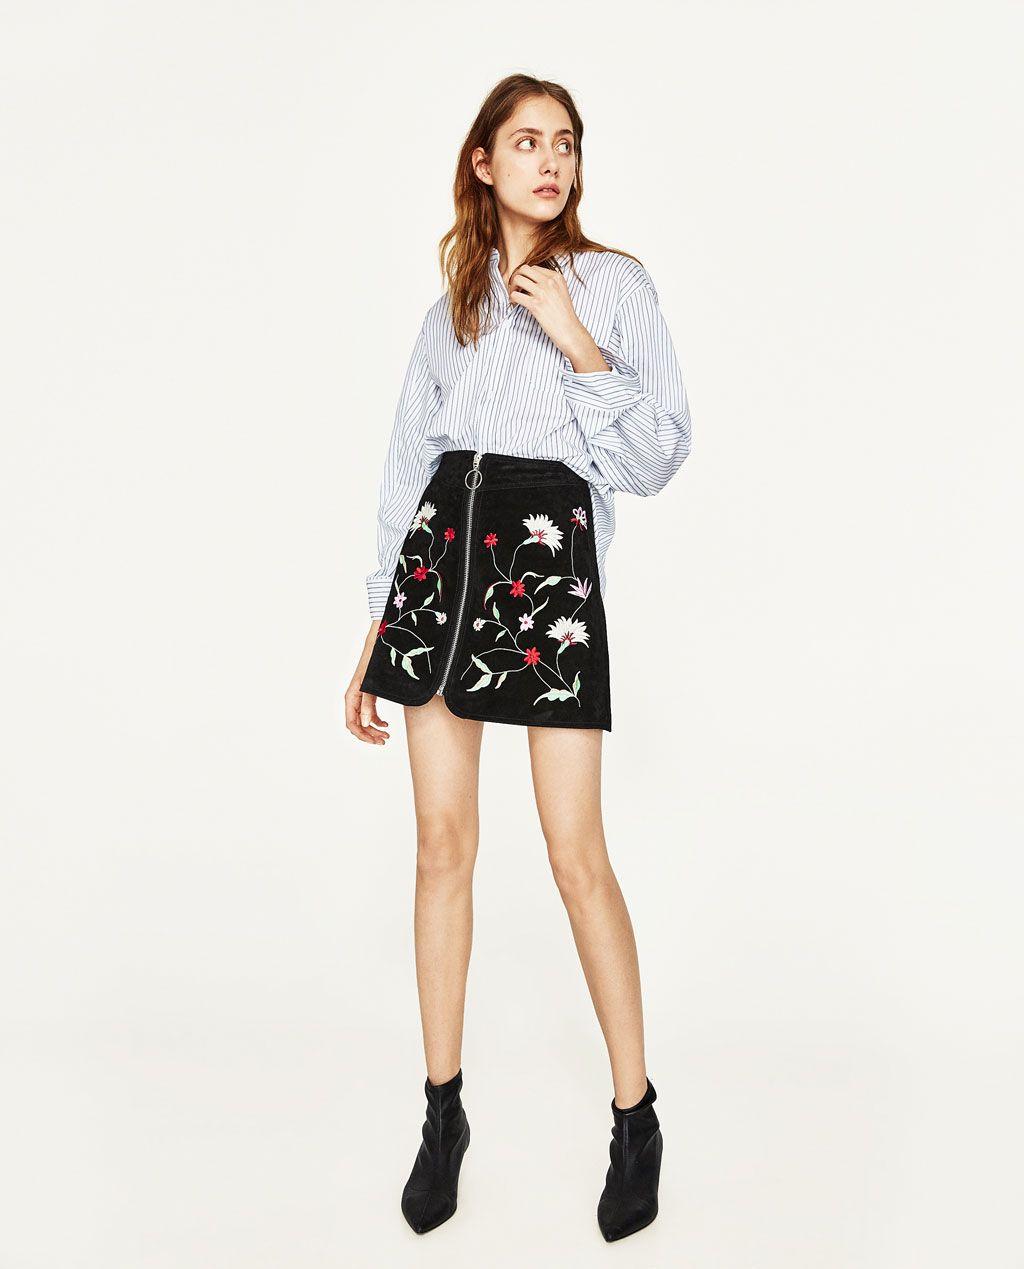 FALDA MINI ANTE BORDADA. Checked SkirtsWomen's SkirtsMini SkirtsSuede Mini  SkirtEmbroideryStyle InspirationMinisZara WomenEmbroidered Flowers